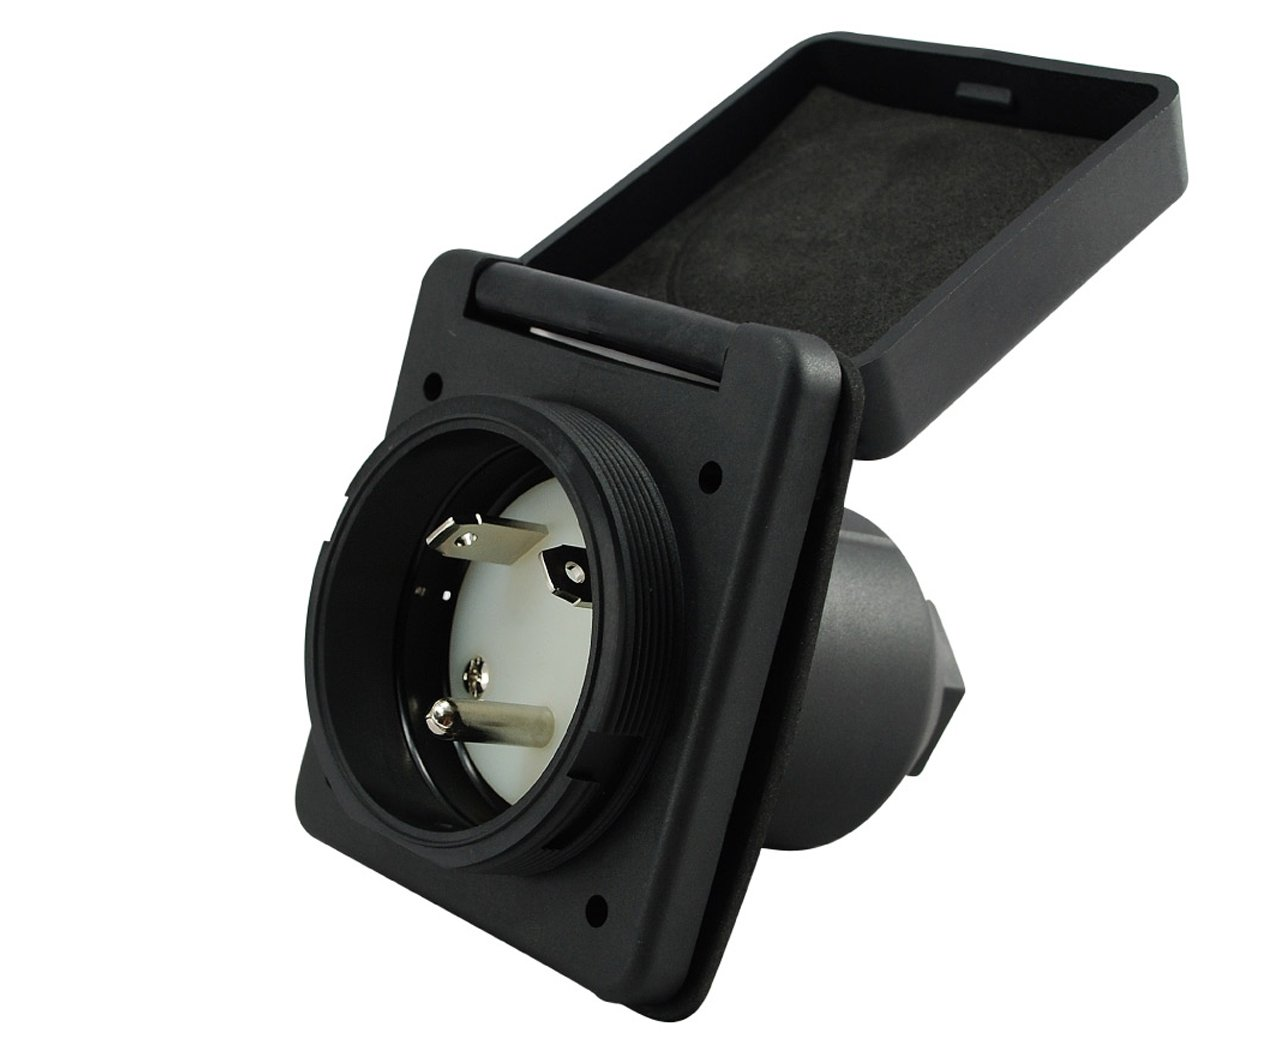 Conntek RV 30-Amp Straight Blade Black Squire Cover RV/Marine Inlet